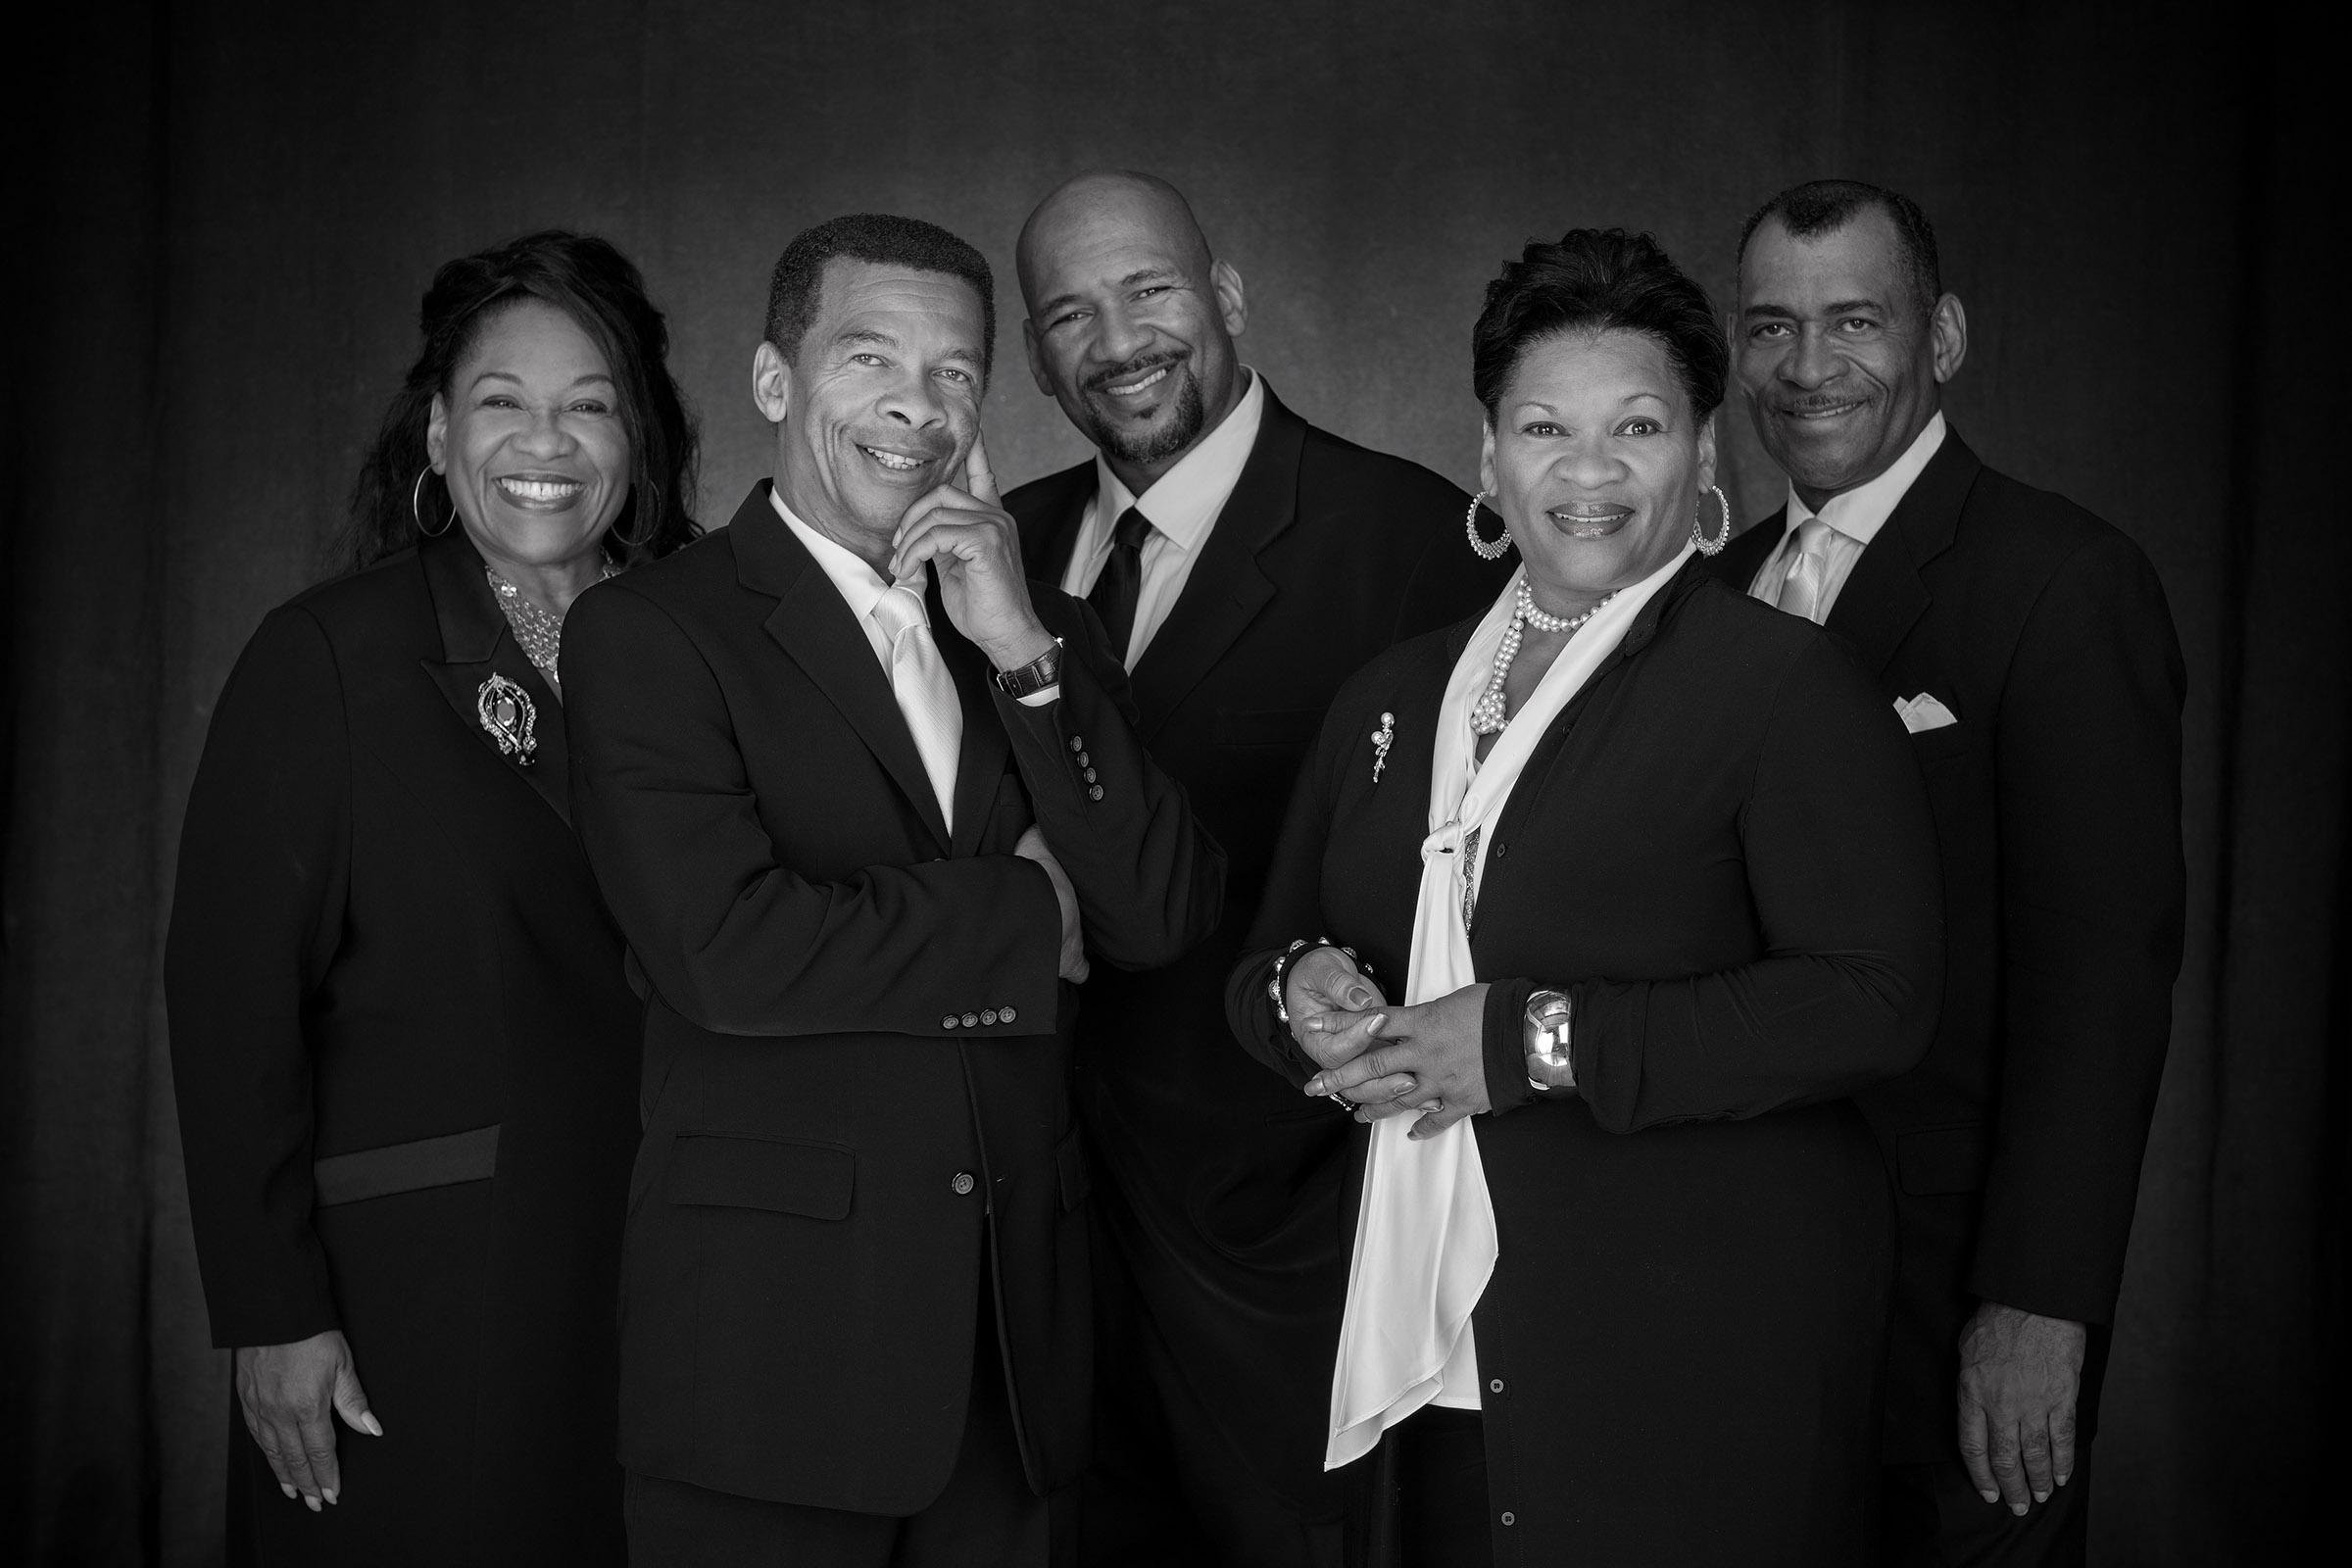 The Steeles - Internationally Acclaimed Gospel/R&B/Soul Powerhouse. (Prince,George Clinton, Mavis Staples)